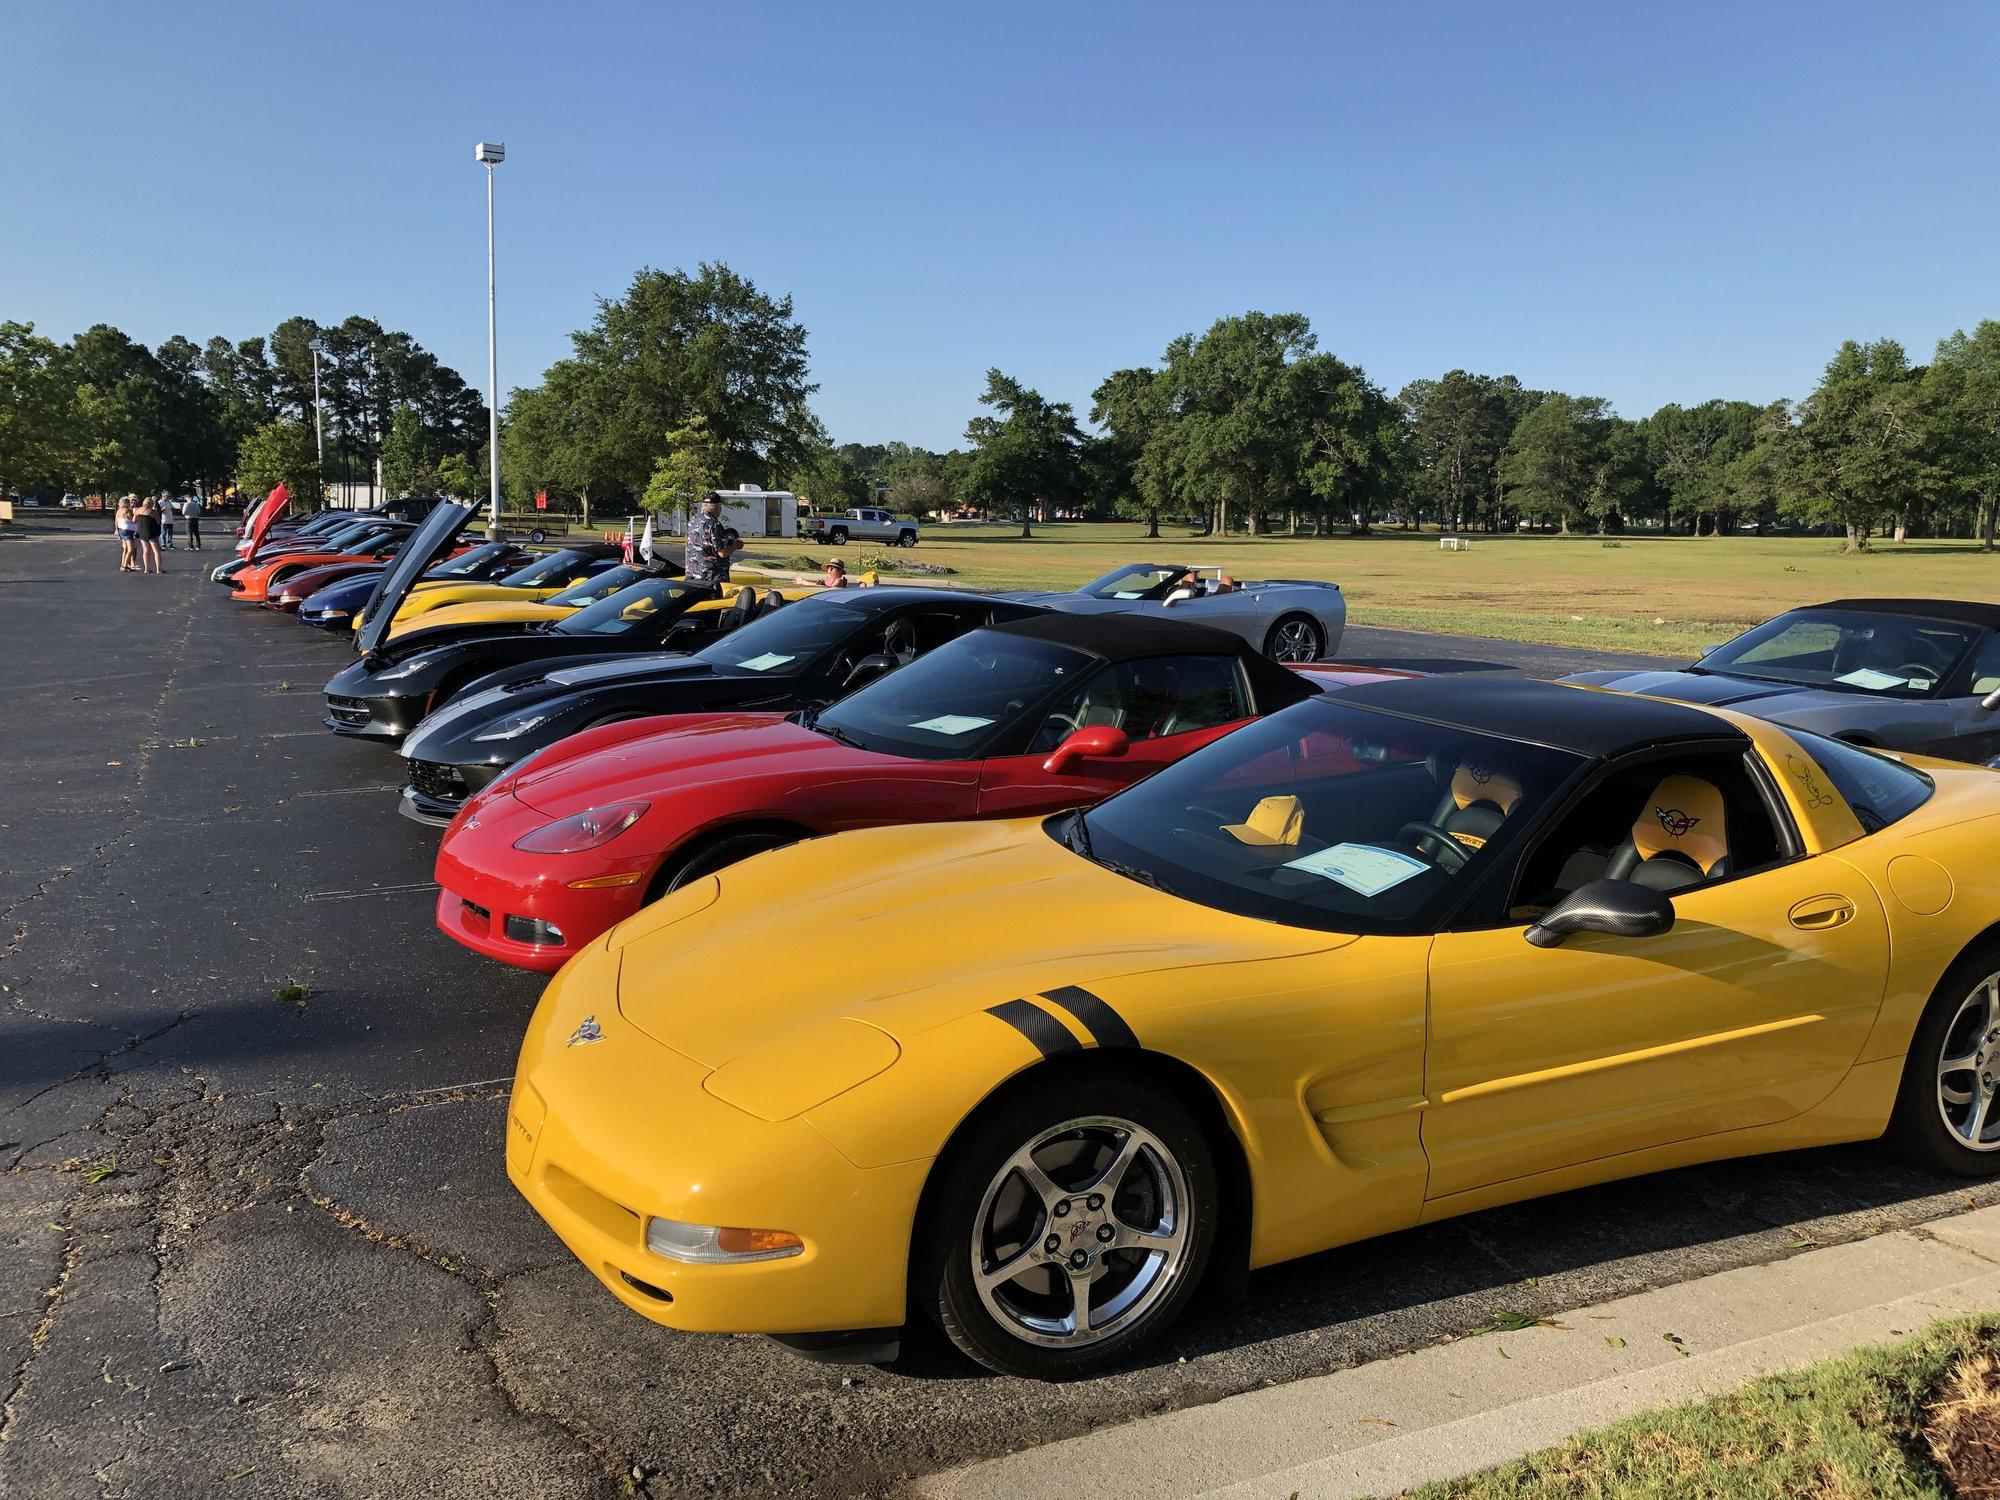 24th Annual Myrtle Beach Corvette Show